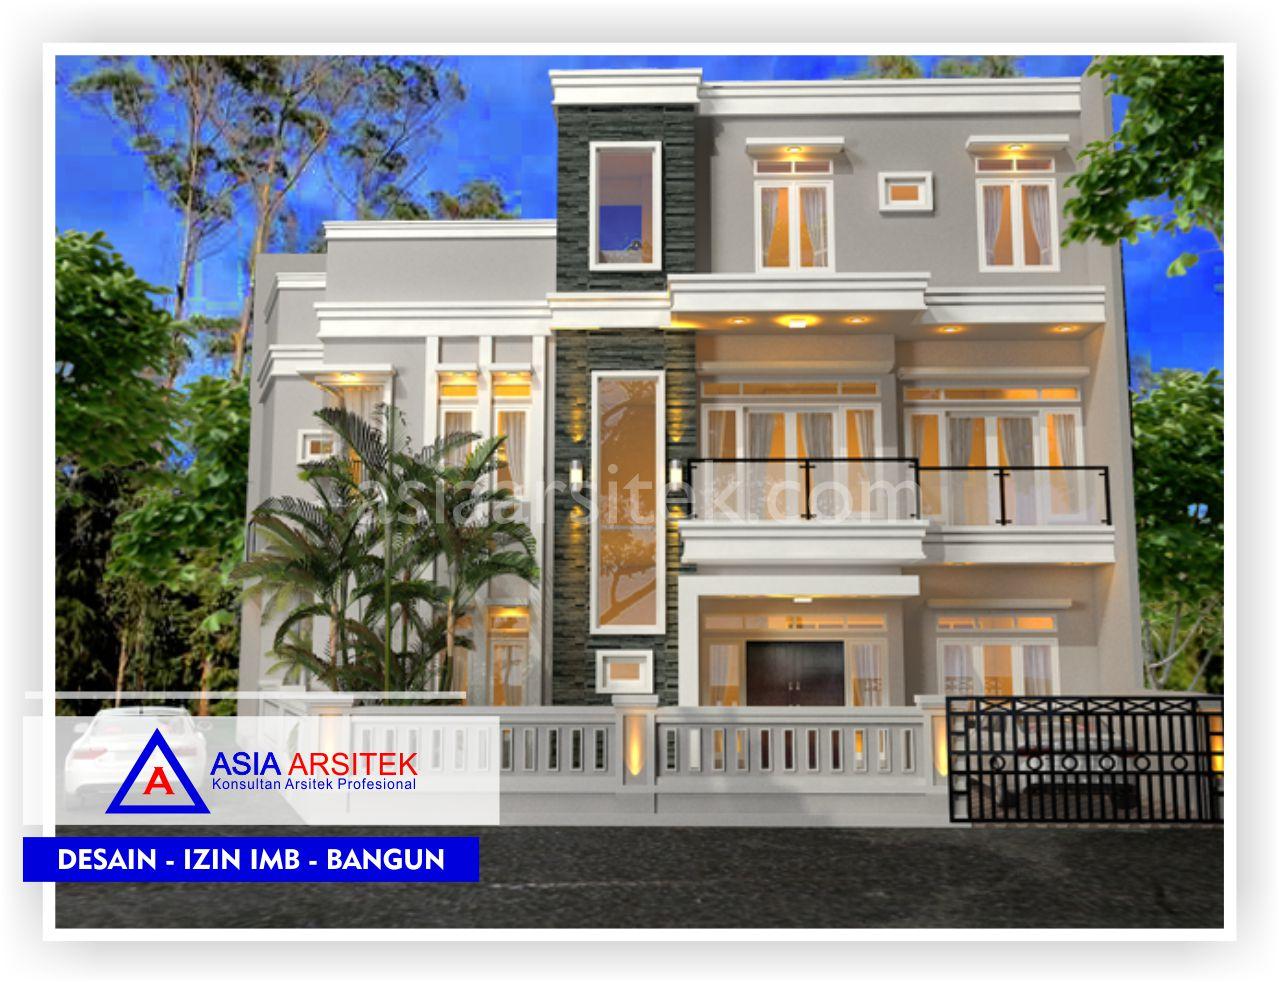 Portofolio Realisasi Rumah Minimalis 2 5 Lantai Bpk Hendra Sun Kho